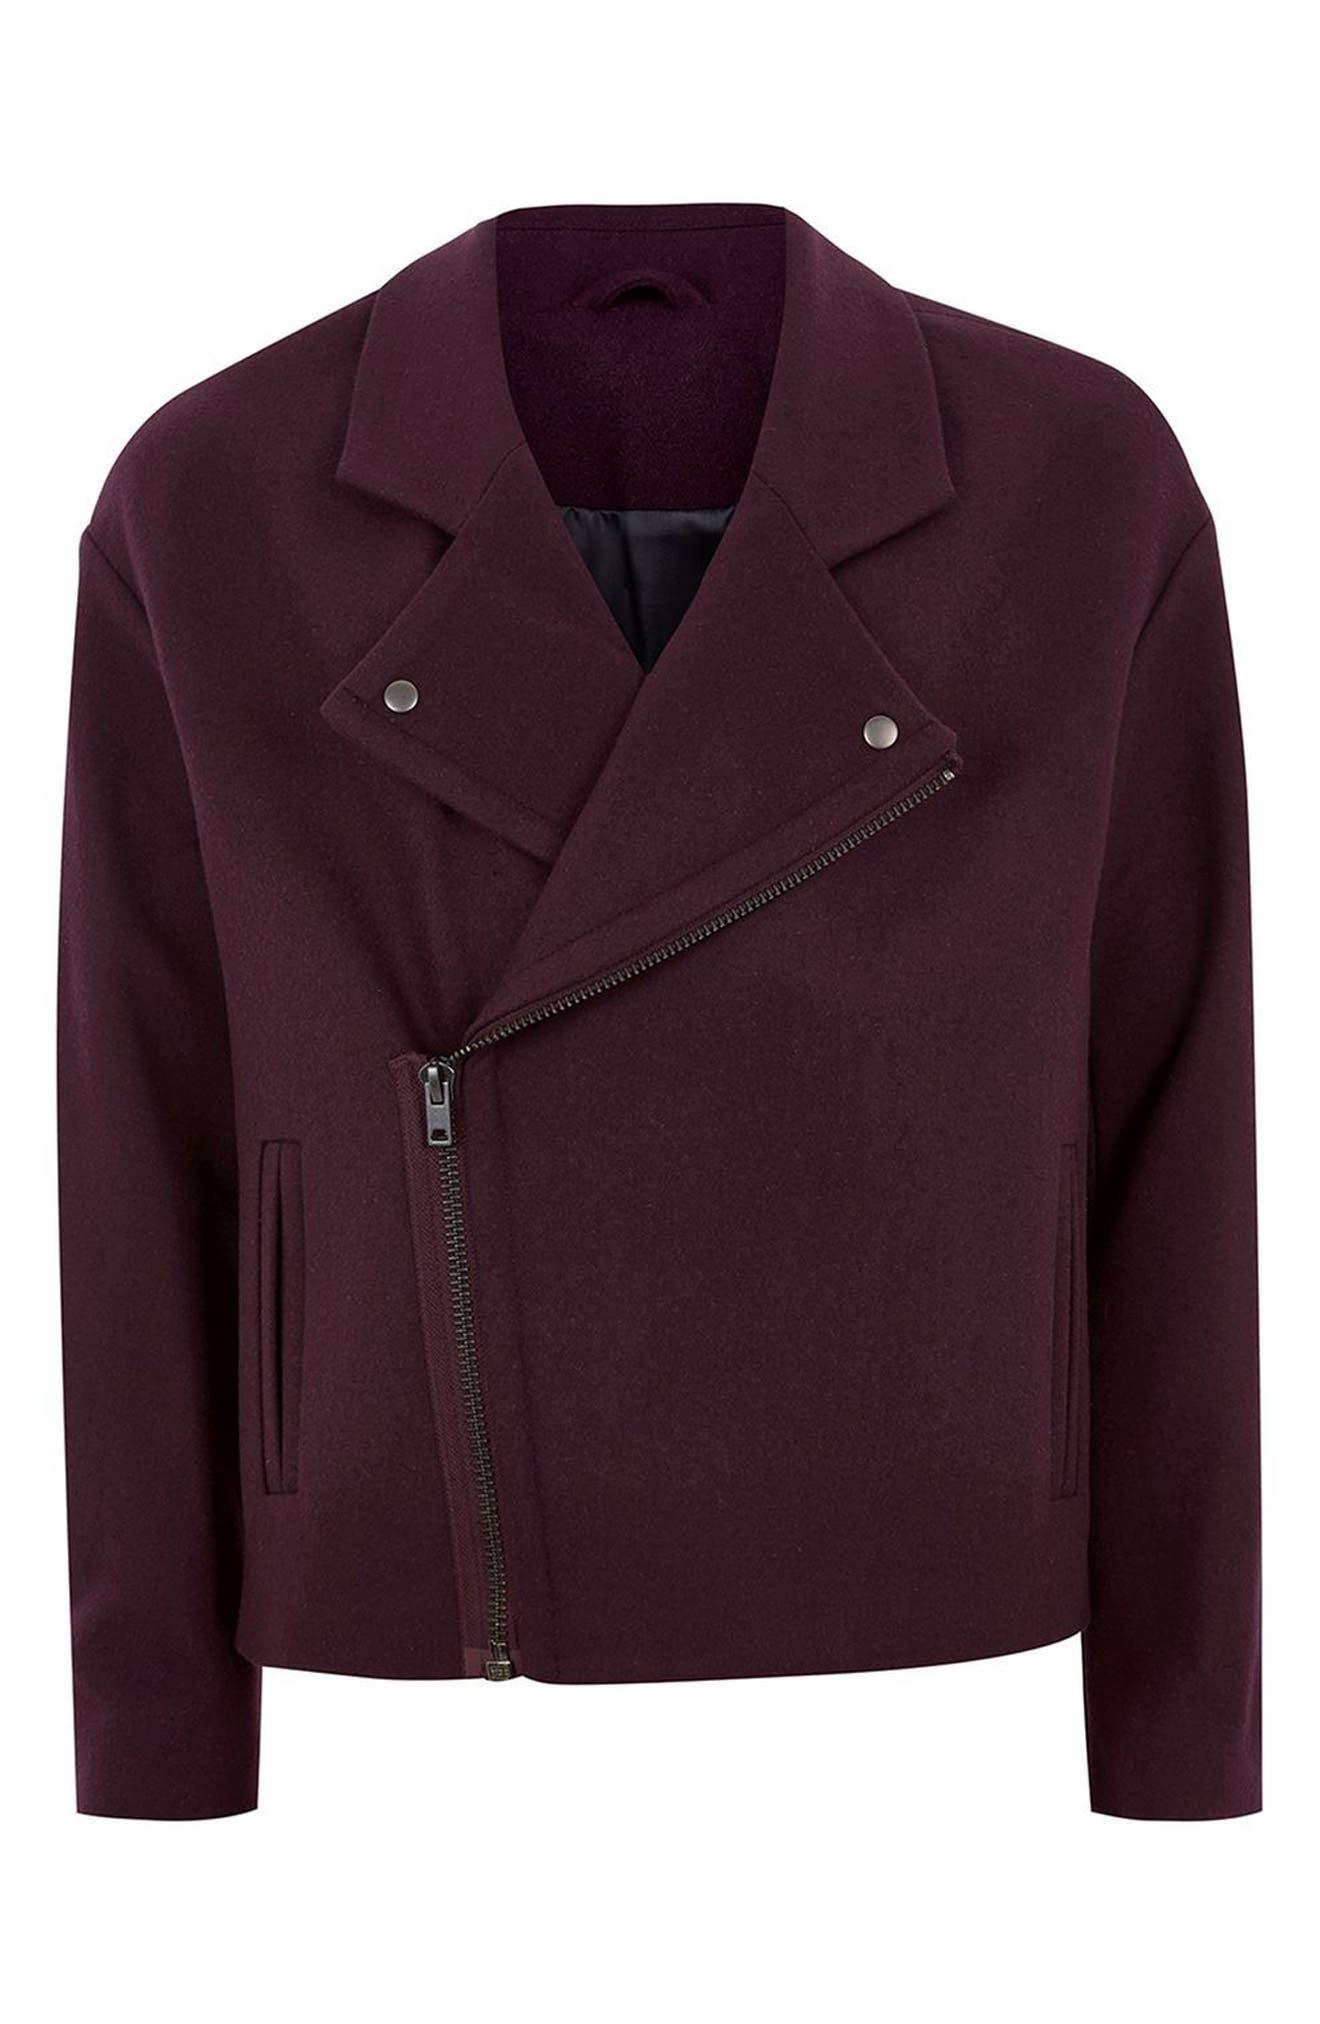 Wool Blend Biker Jacket,                             Alternate thumbnail 4, color,                             930